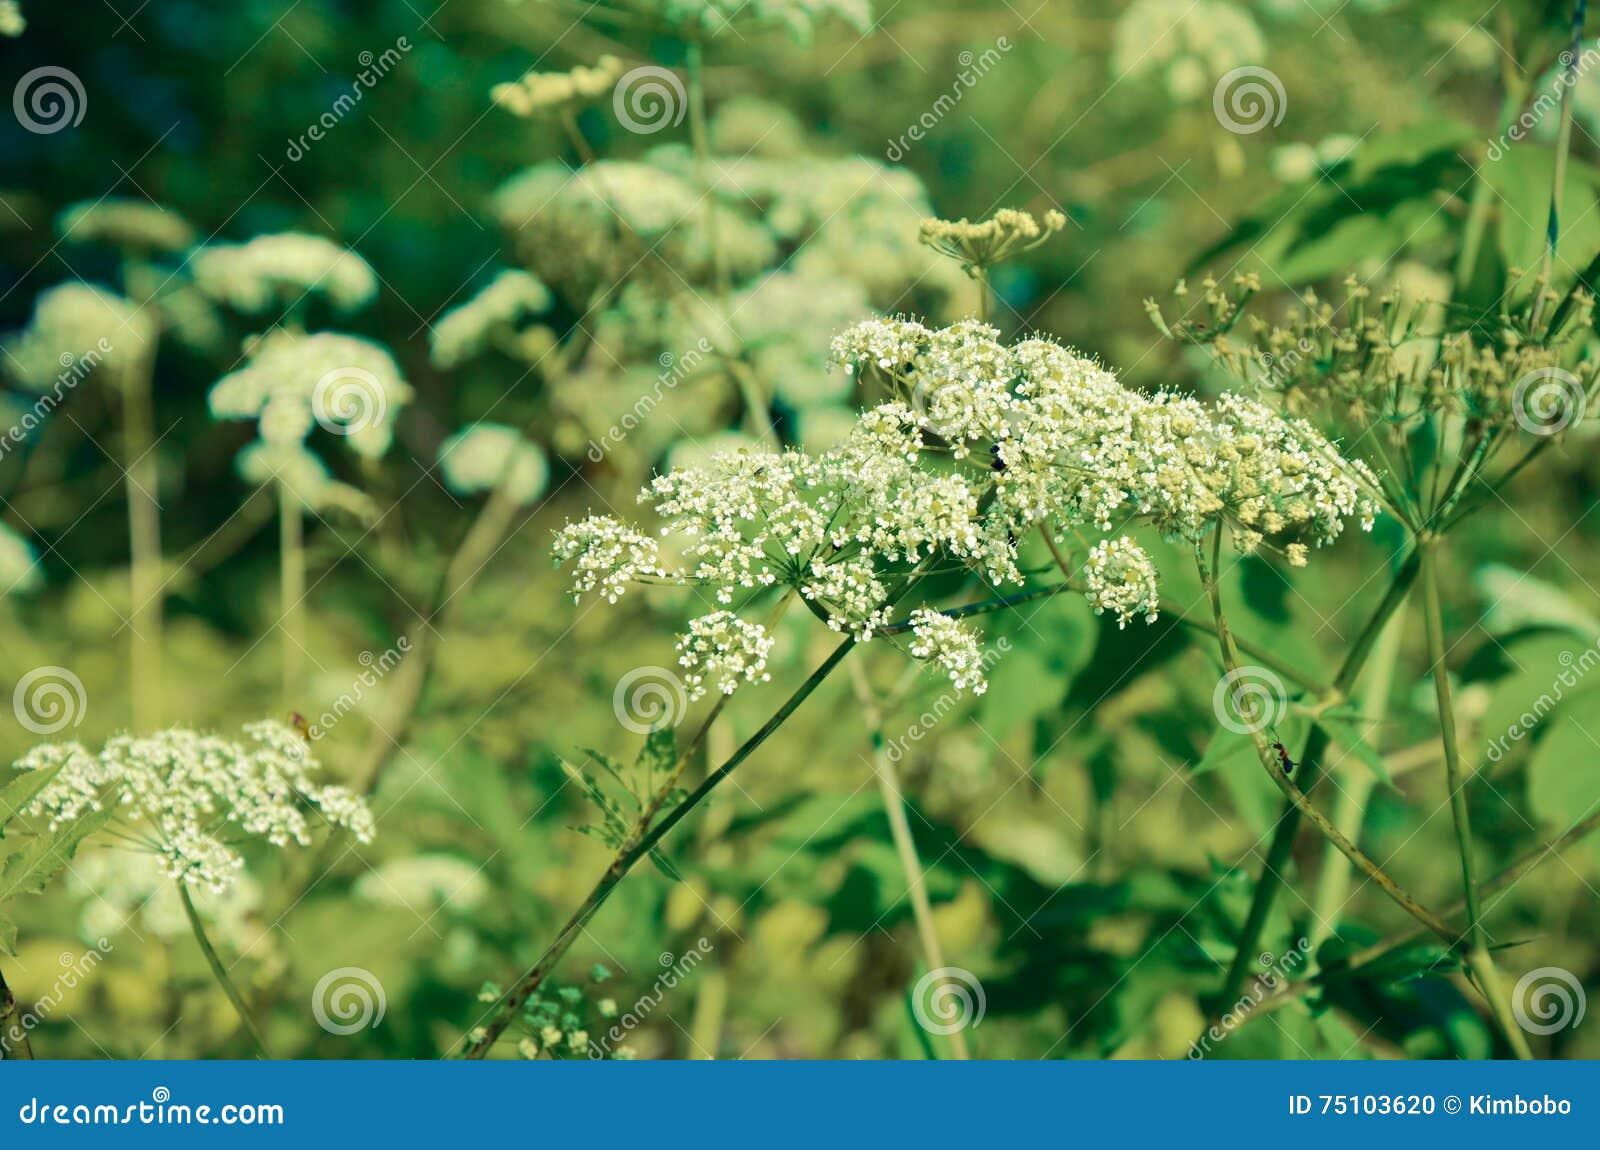 wiesen kerbel anthriscus sylvestris wei e sommerfeldblume stockfoto bild 75103620. Black Bedroom Furniture Sets. Home Design Ideas